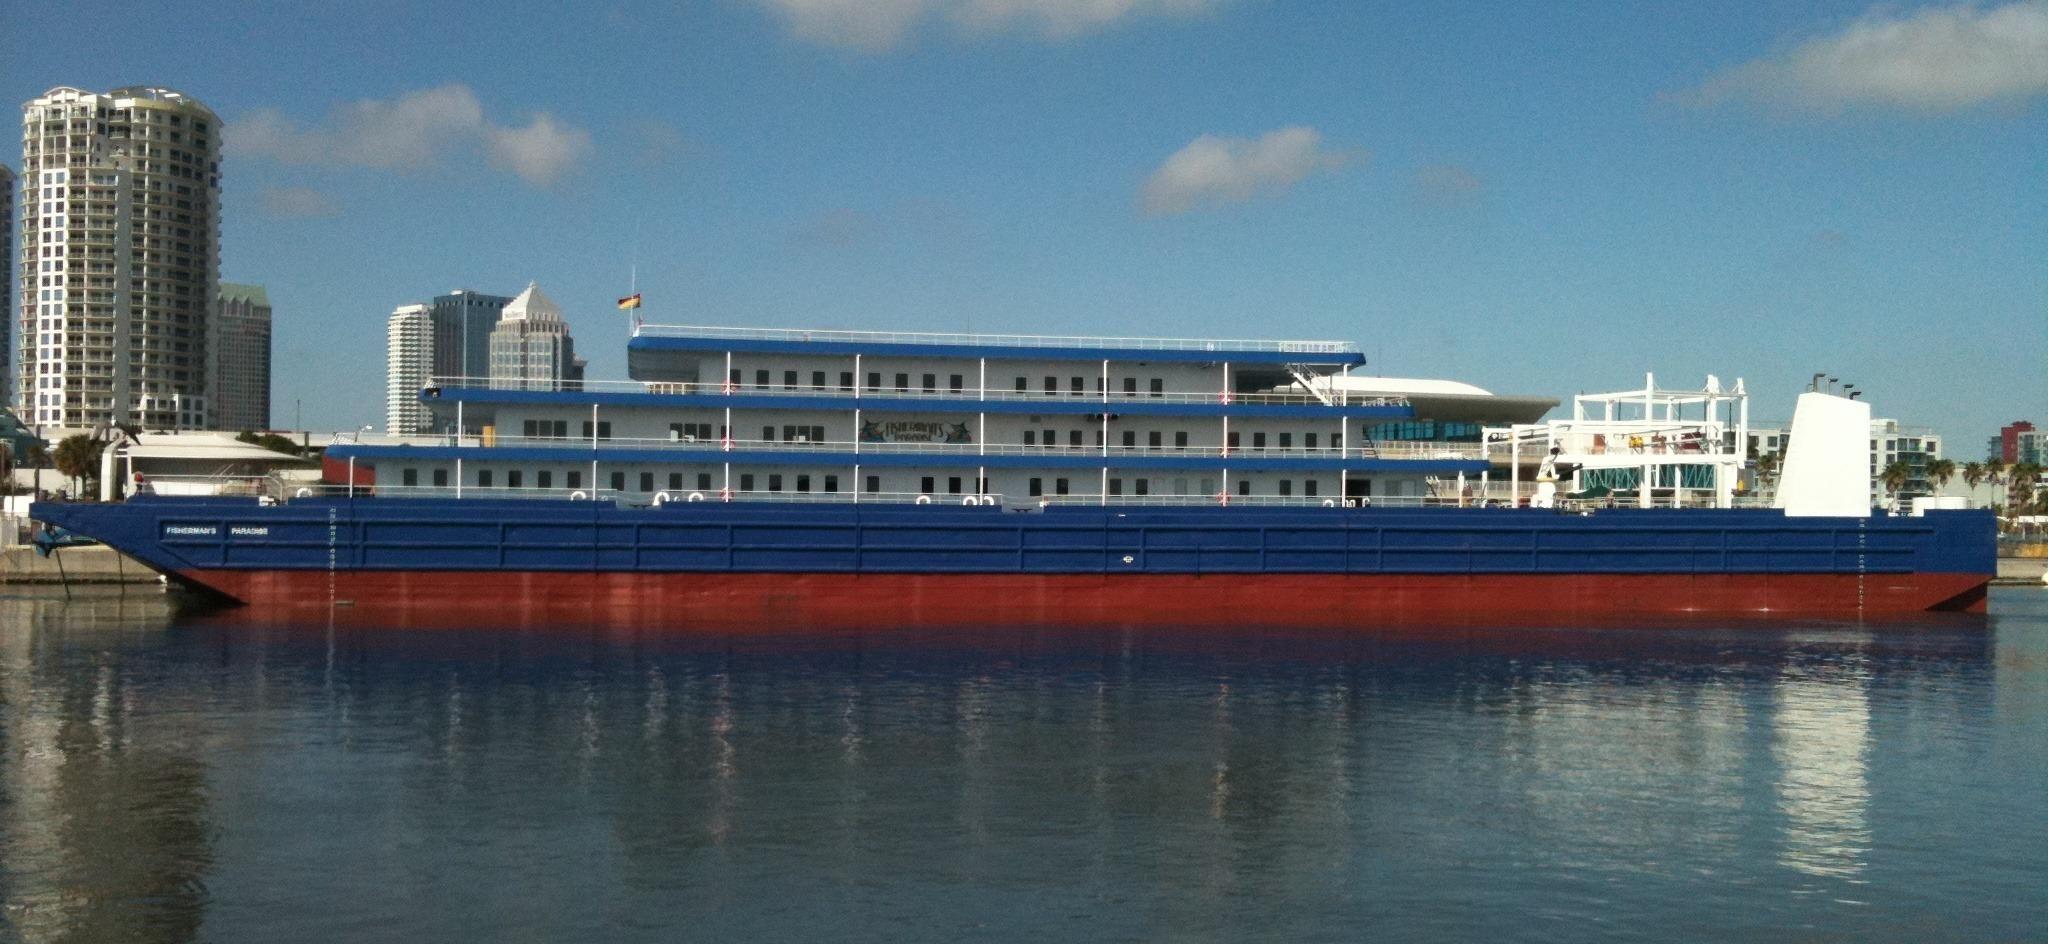 2009 floating boutique hotel barge moteur bateau vendre for Moteur hotel